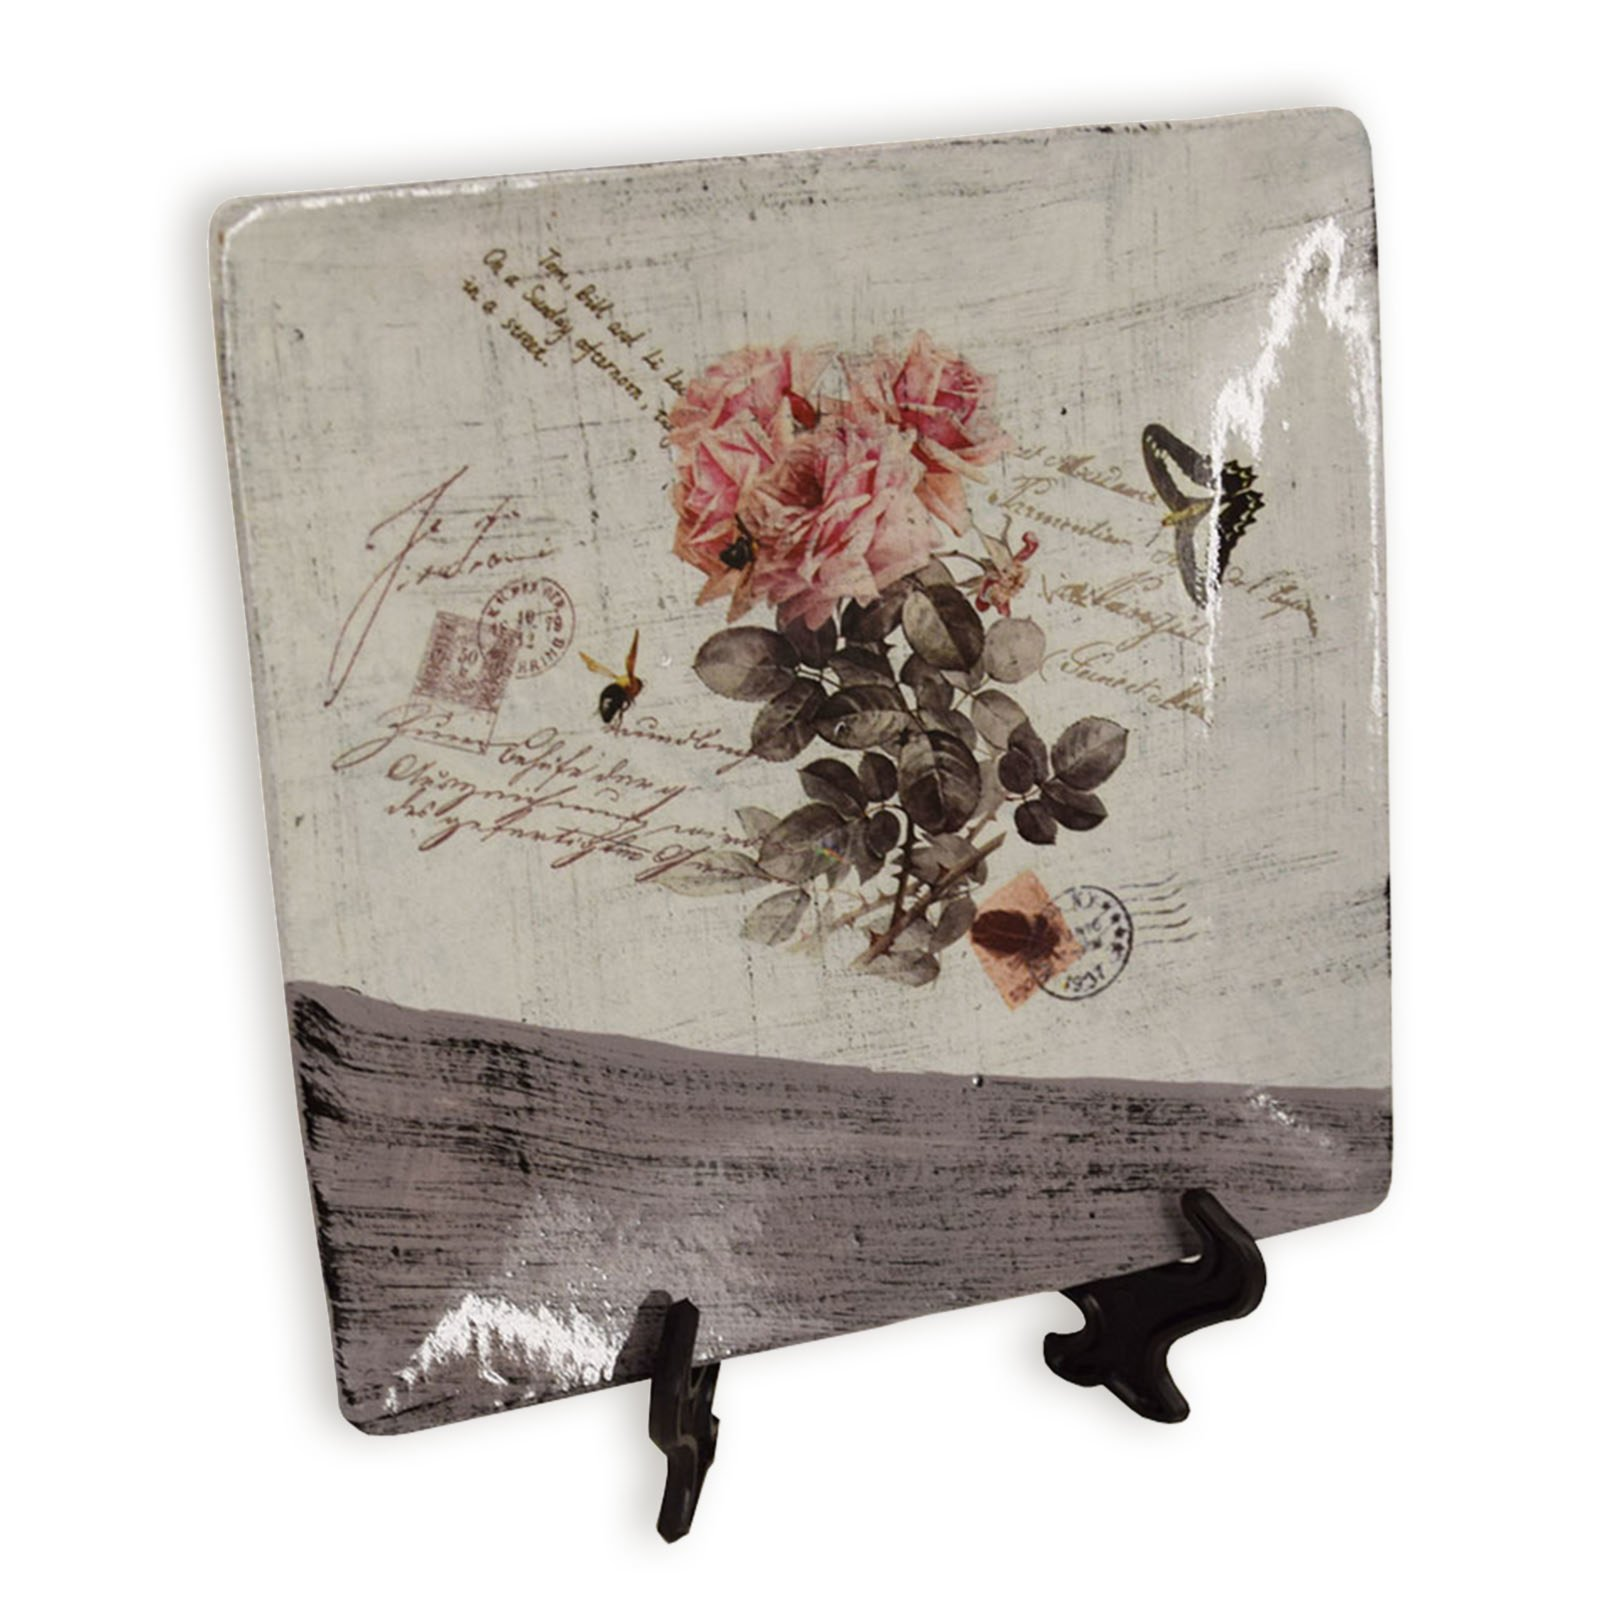 Roller deko teller rosendekor keramik 15x15 cm ebay - Roller deko ...